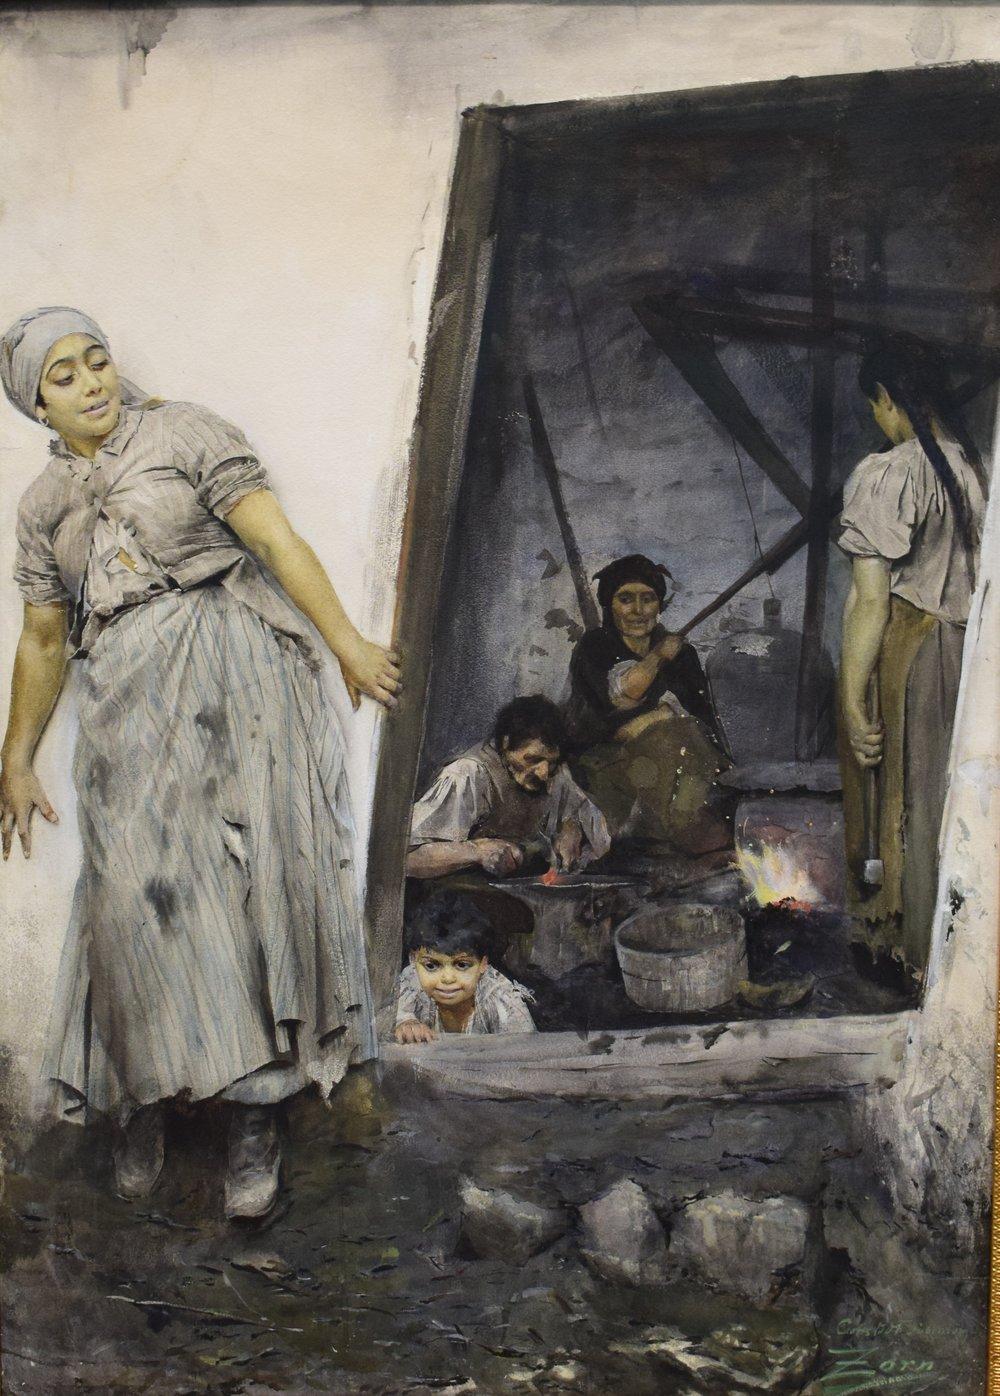 Anders Zorn, Zigenarsmedja (Gipsy Forge), 1885